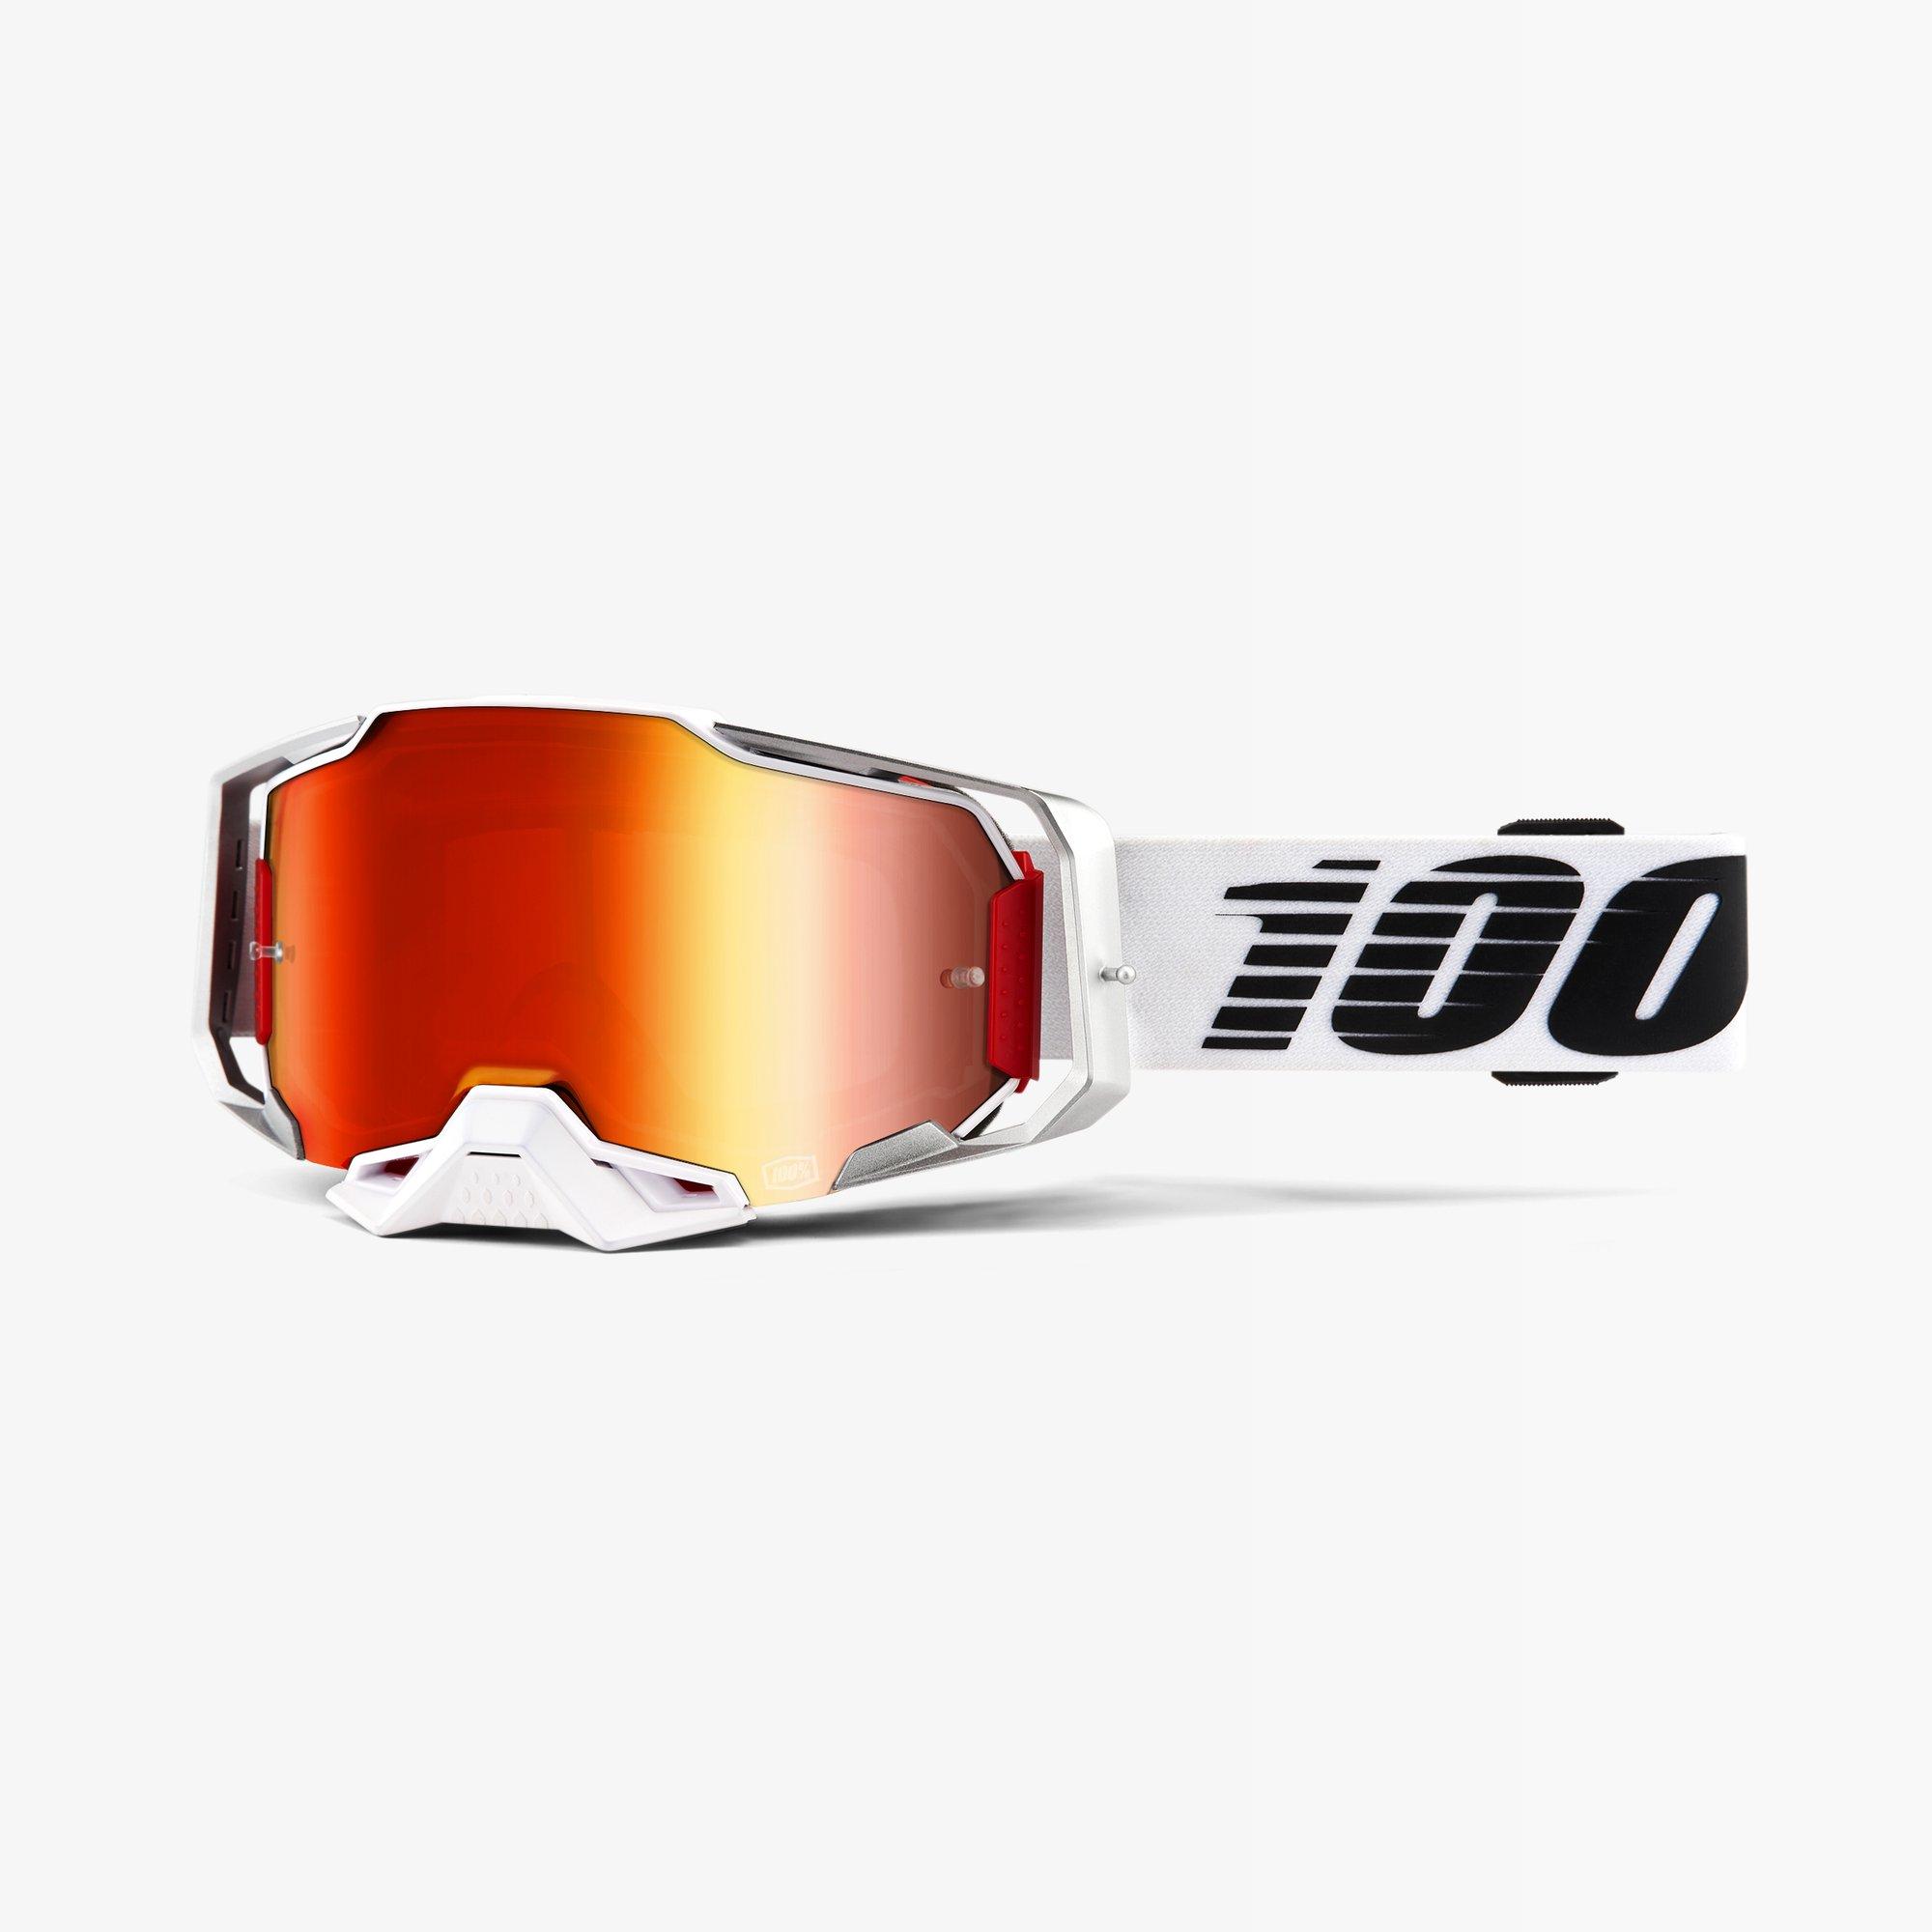 100% Goggle Armega Lightsaber Image